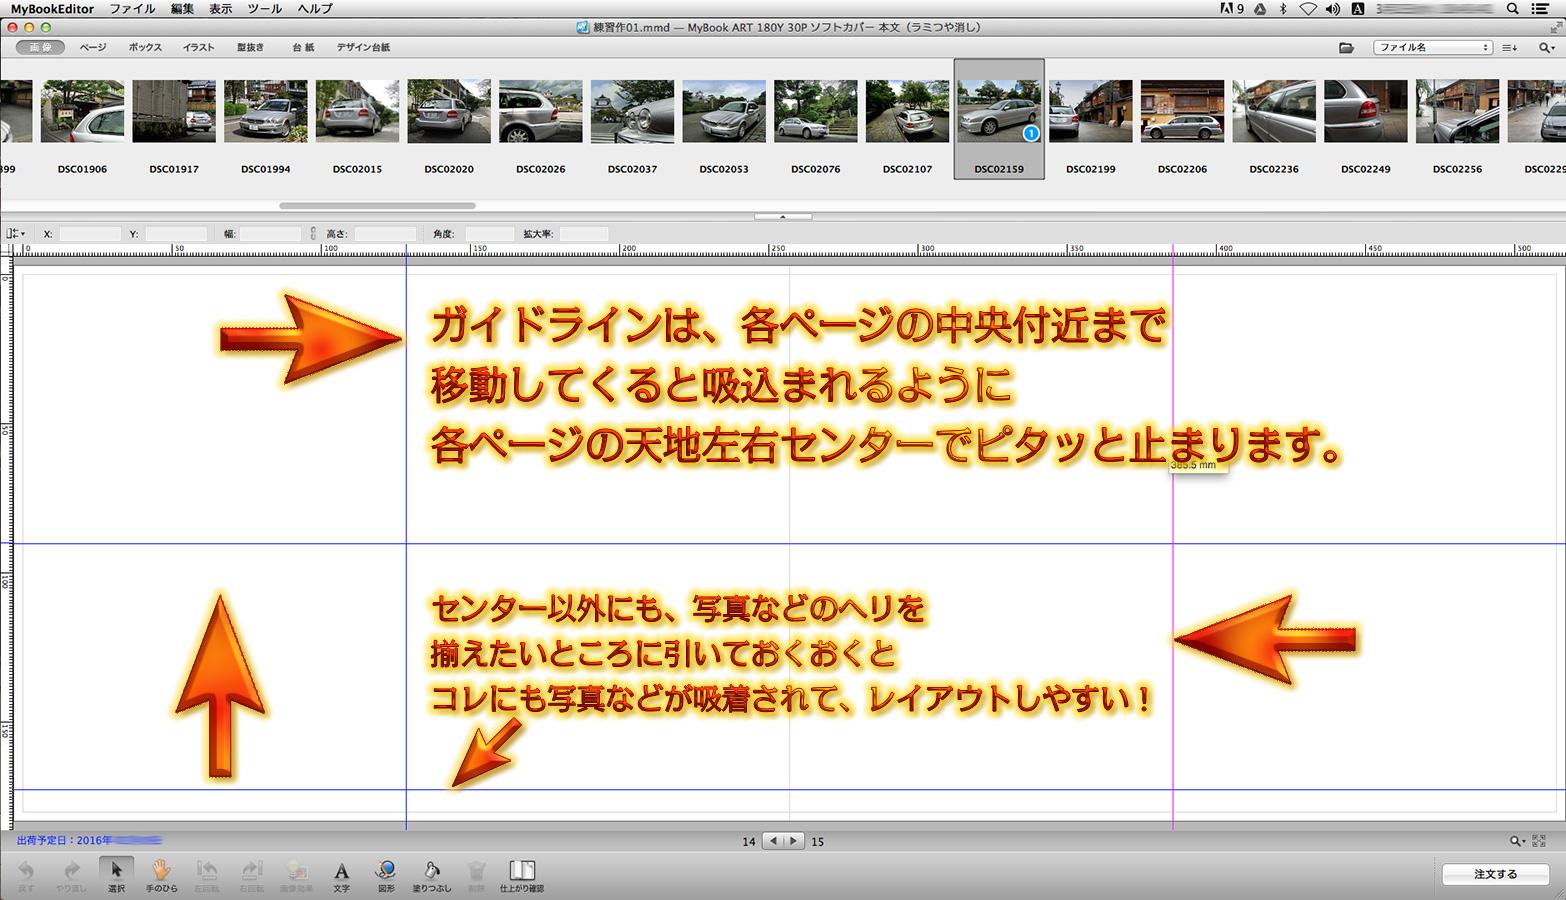 http://moritetsu.info/car/img/mb056-2016-03-02-18-43-41.jpg